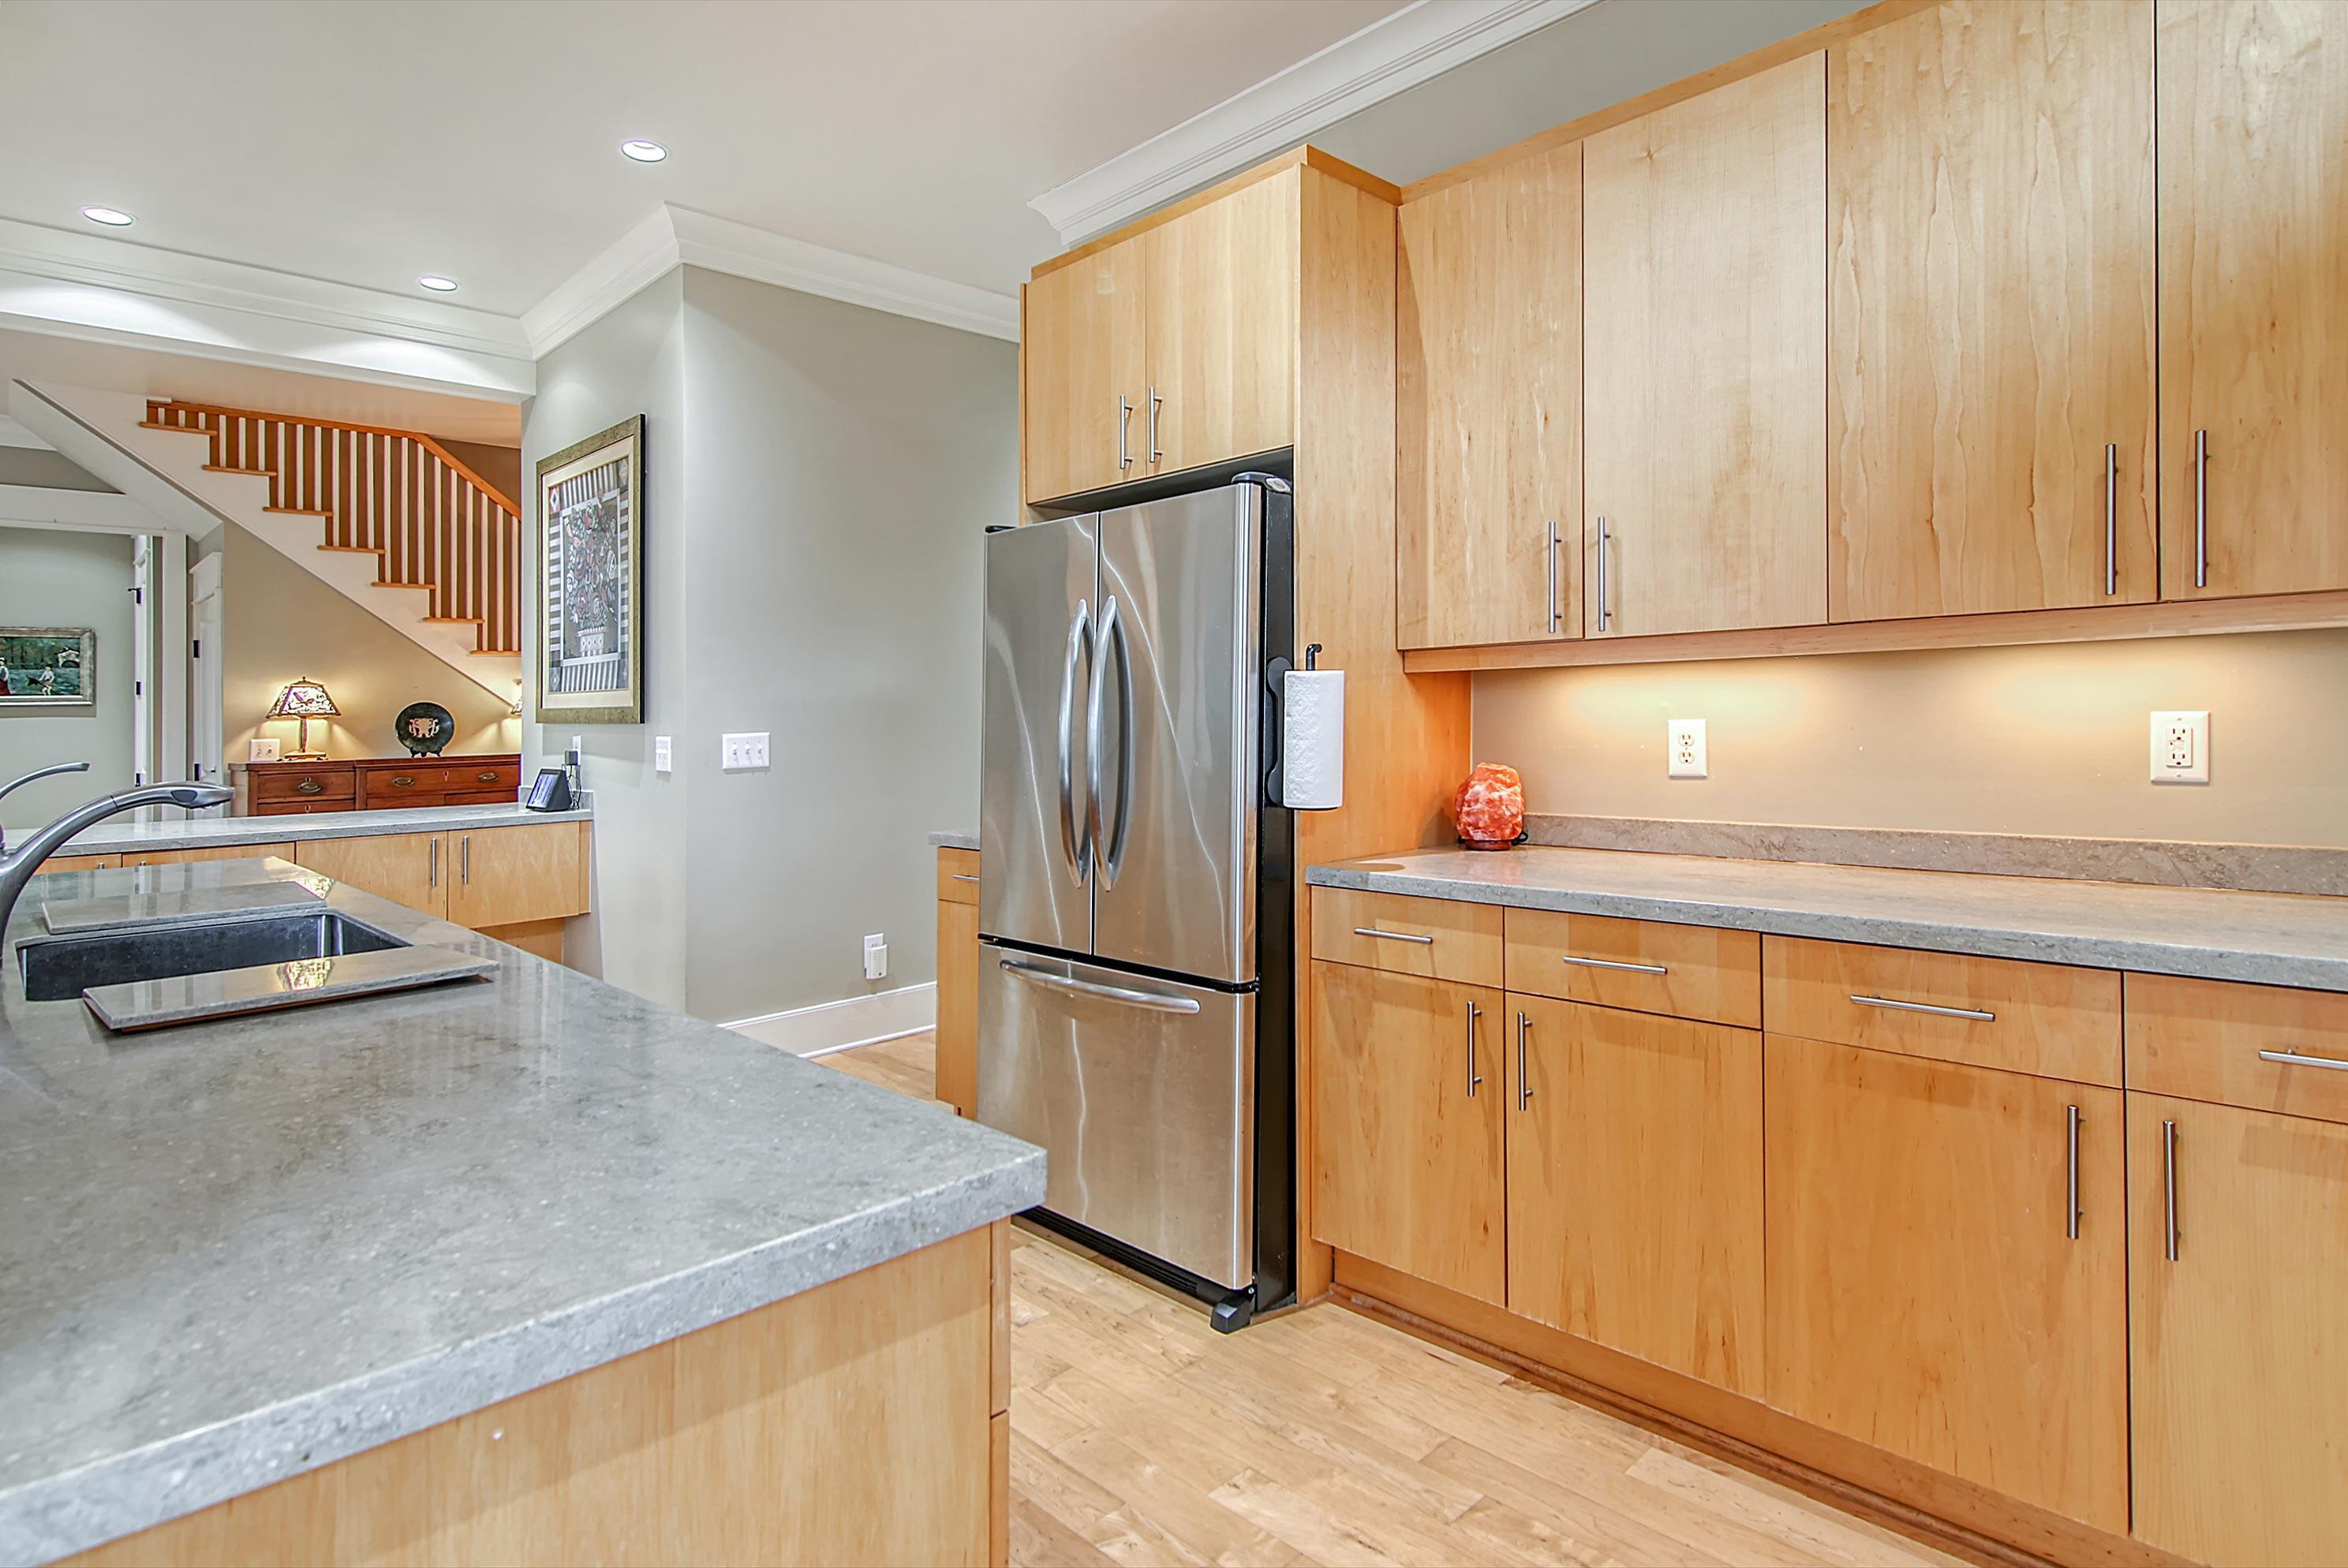 Scanlonville Homes For Sale - 152 6th, Mount Pleasant, SC - 0